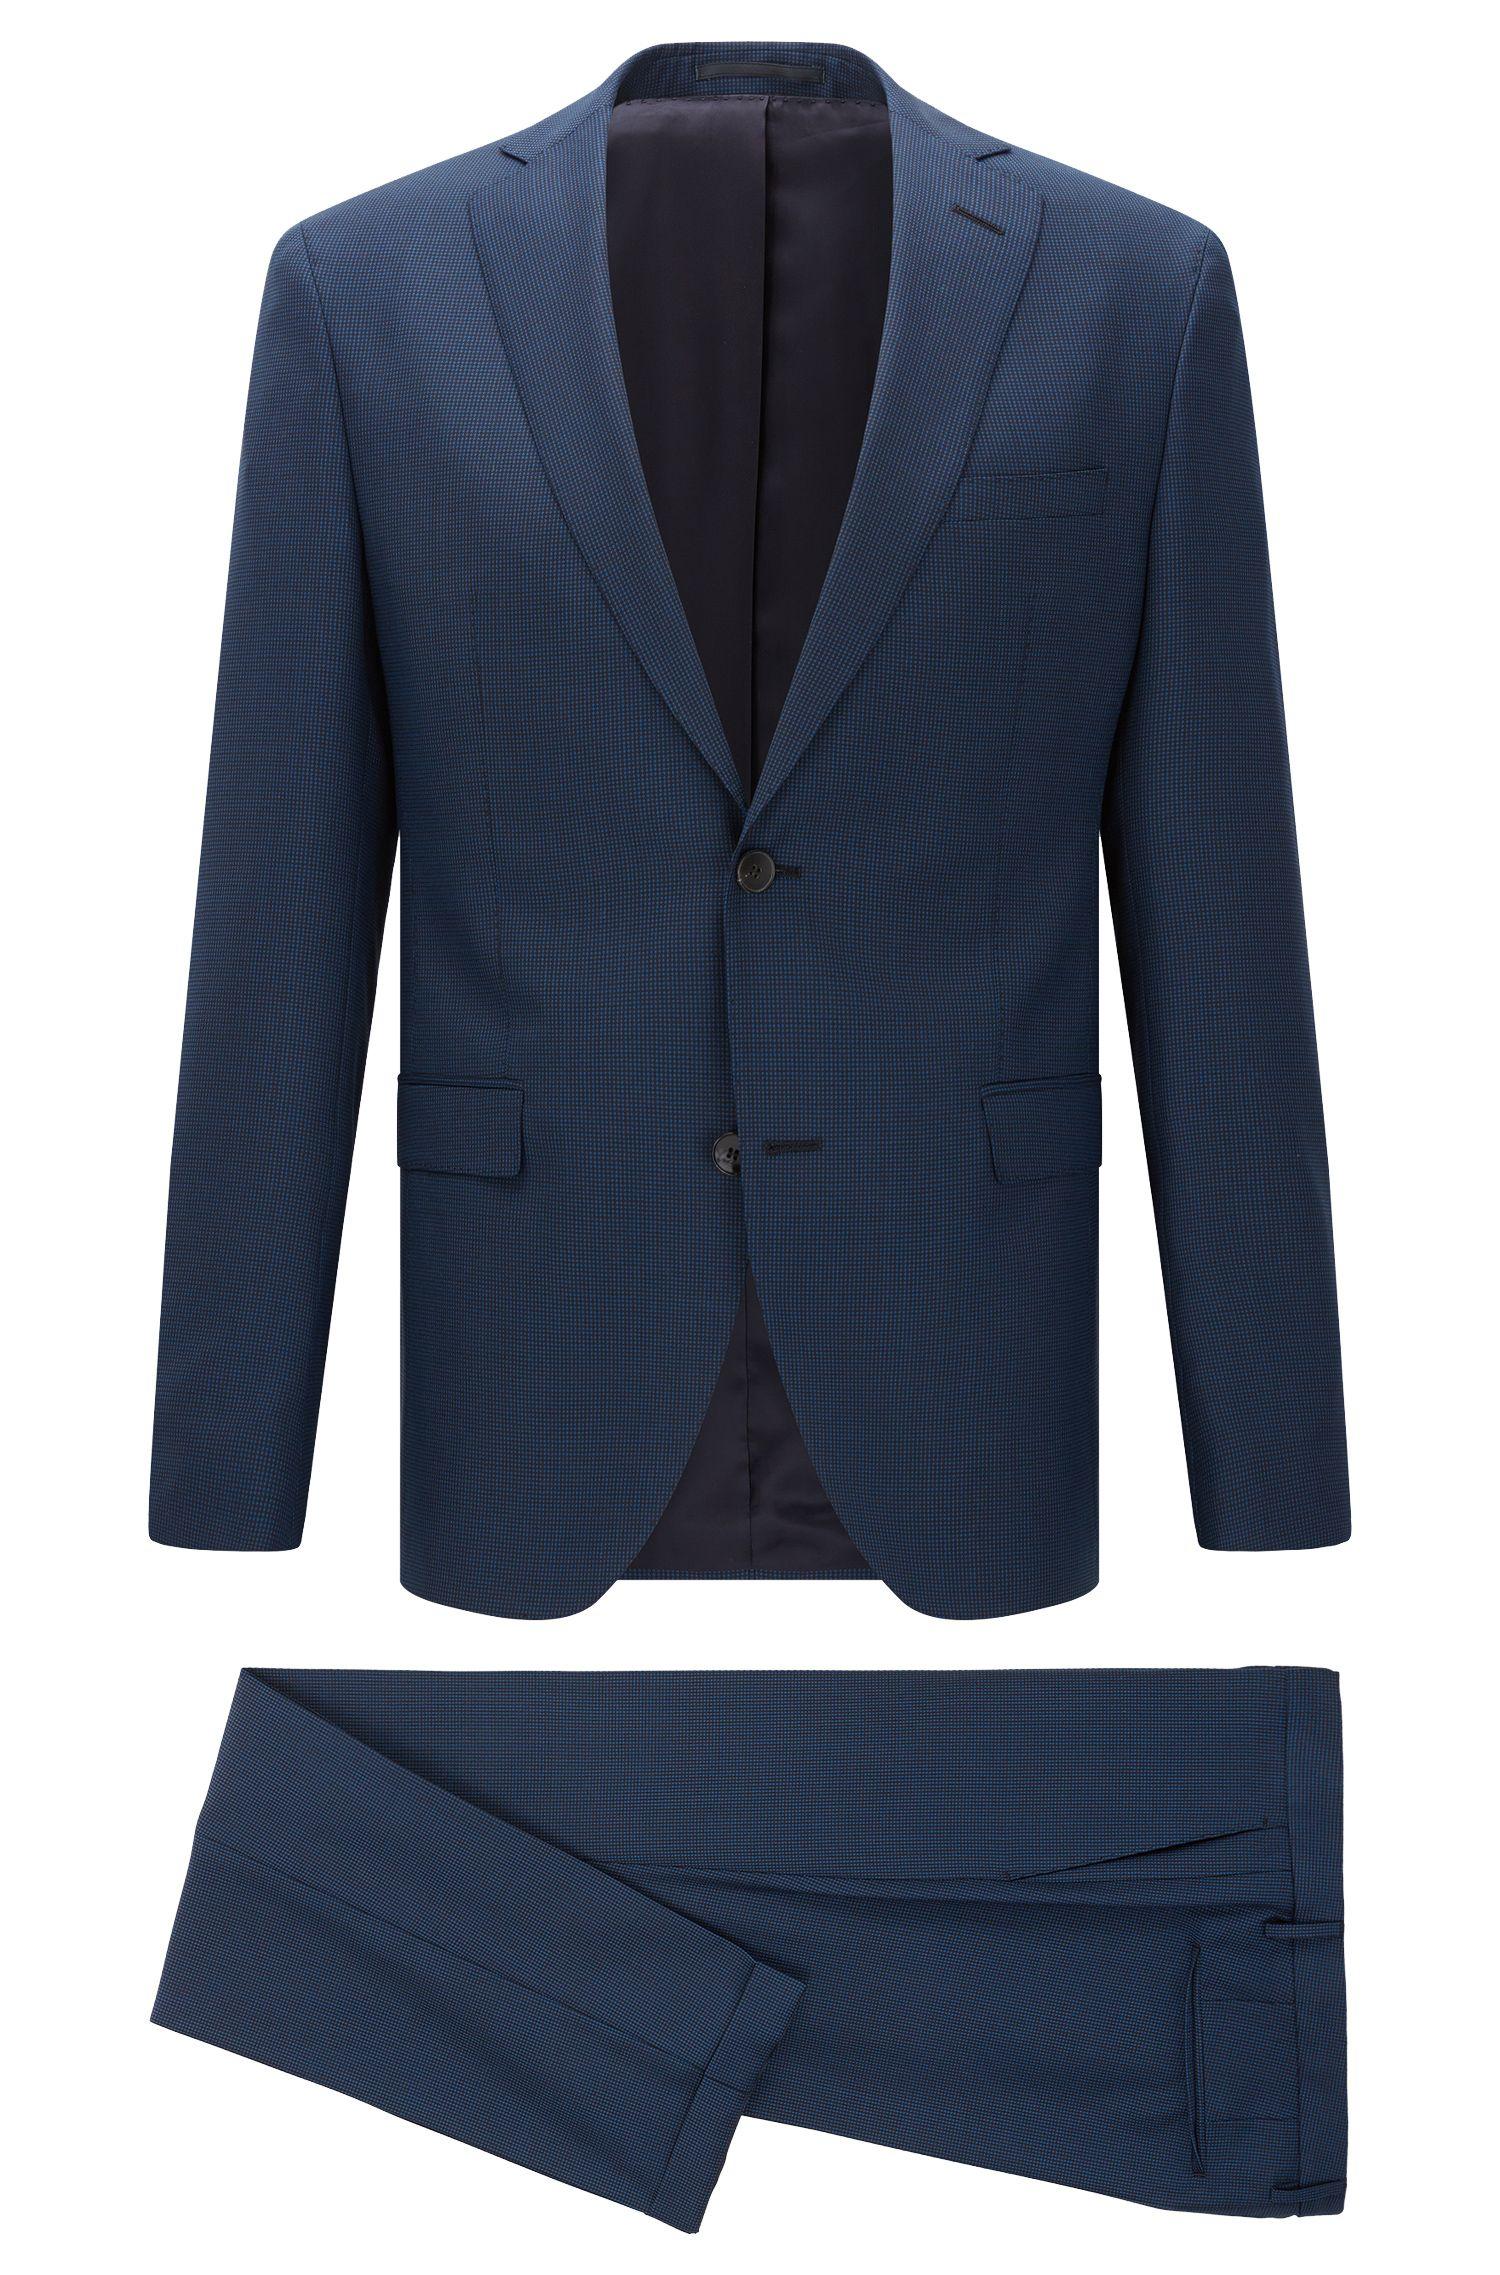 'Reyno/Wave' | Extra-Slim Fit, Birdseye Italian Super 100 Virgin Wool Suit